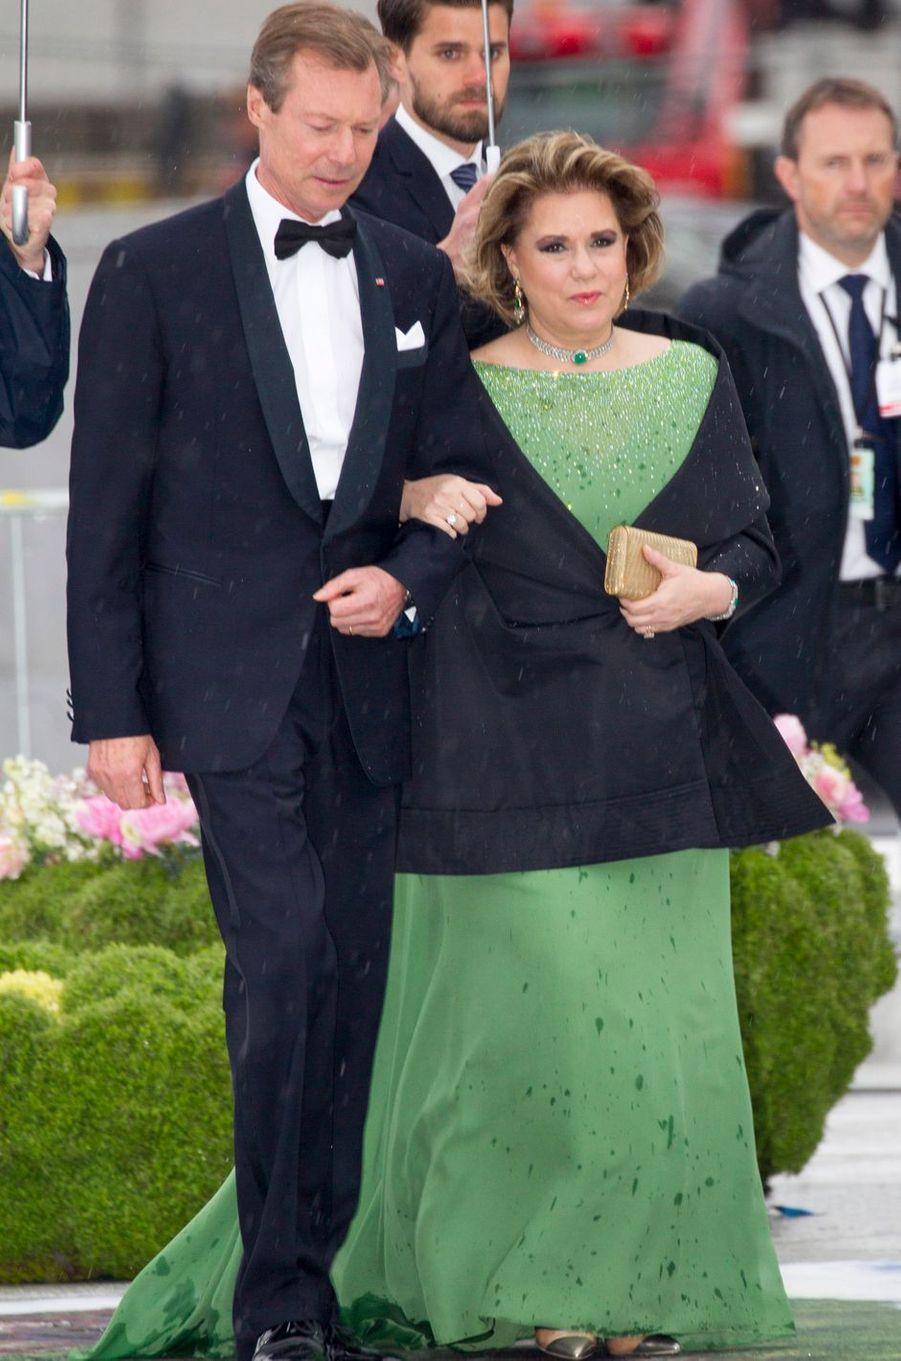 Le grand-duc Henri et la grande-duchesse Maria Teresa de Luxembourg à Oslo, le 10 mai 2017